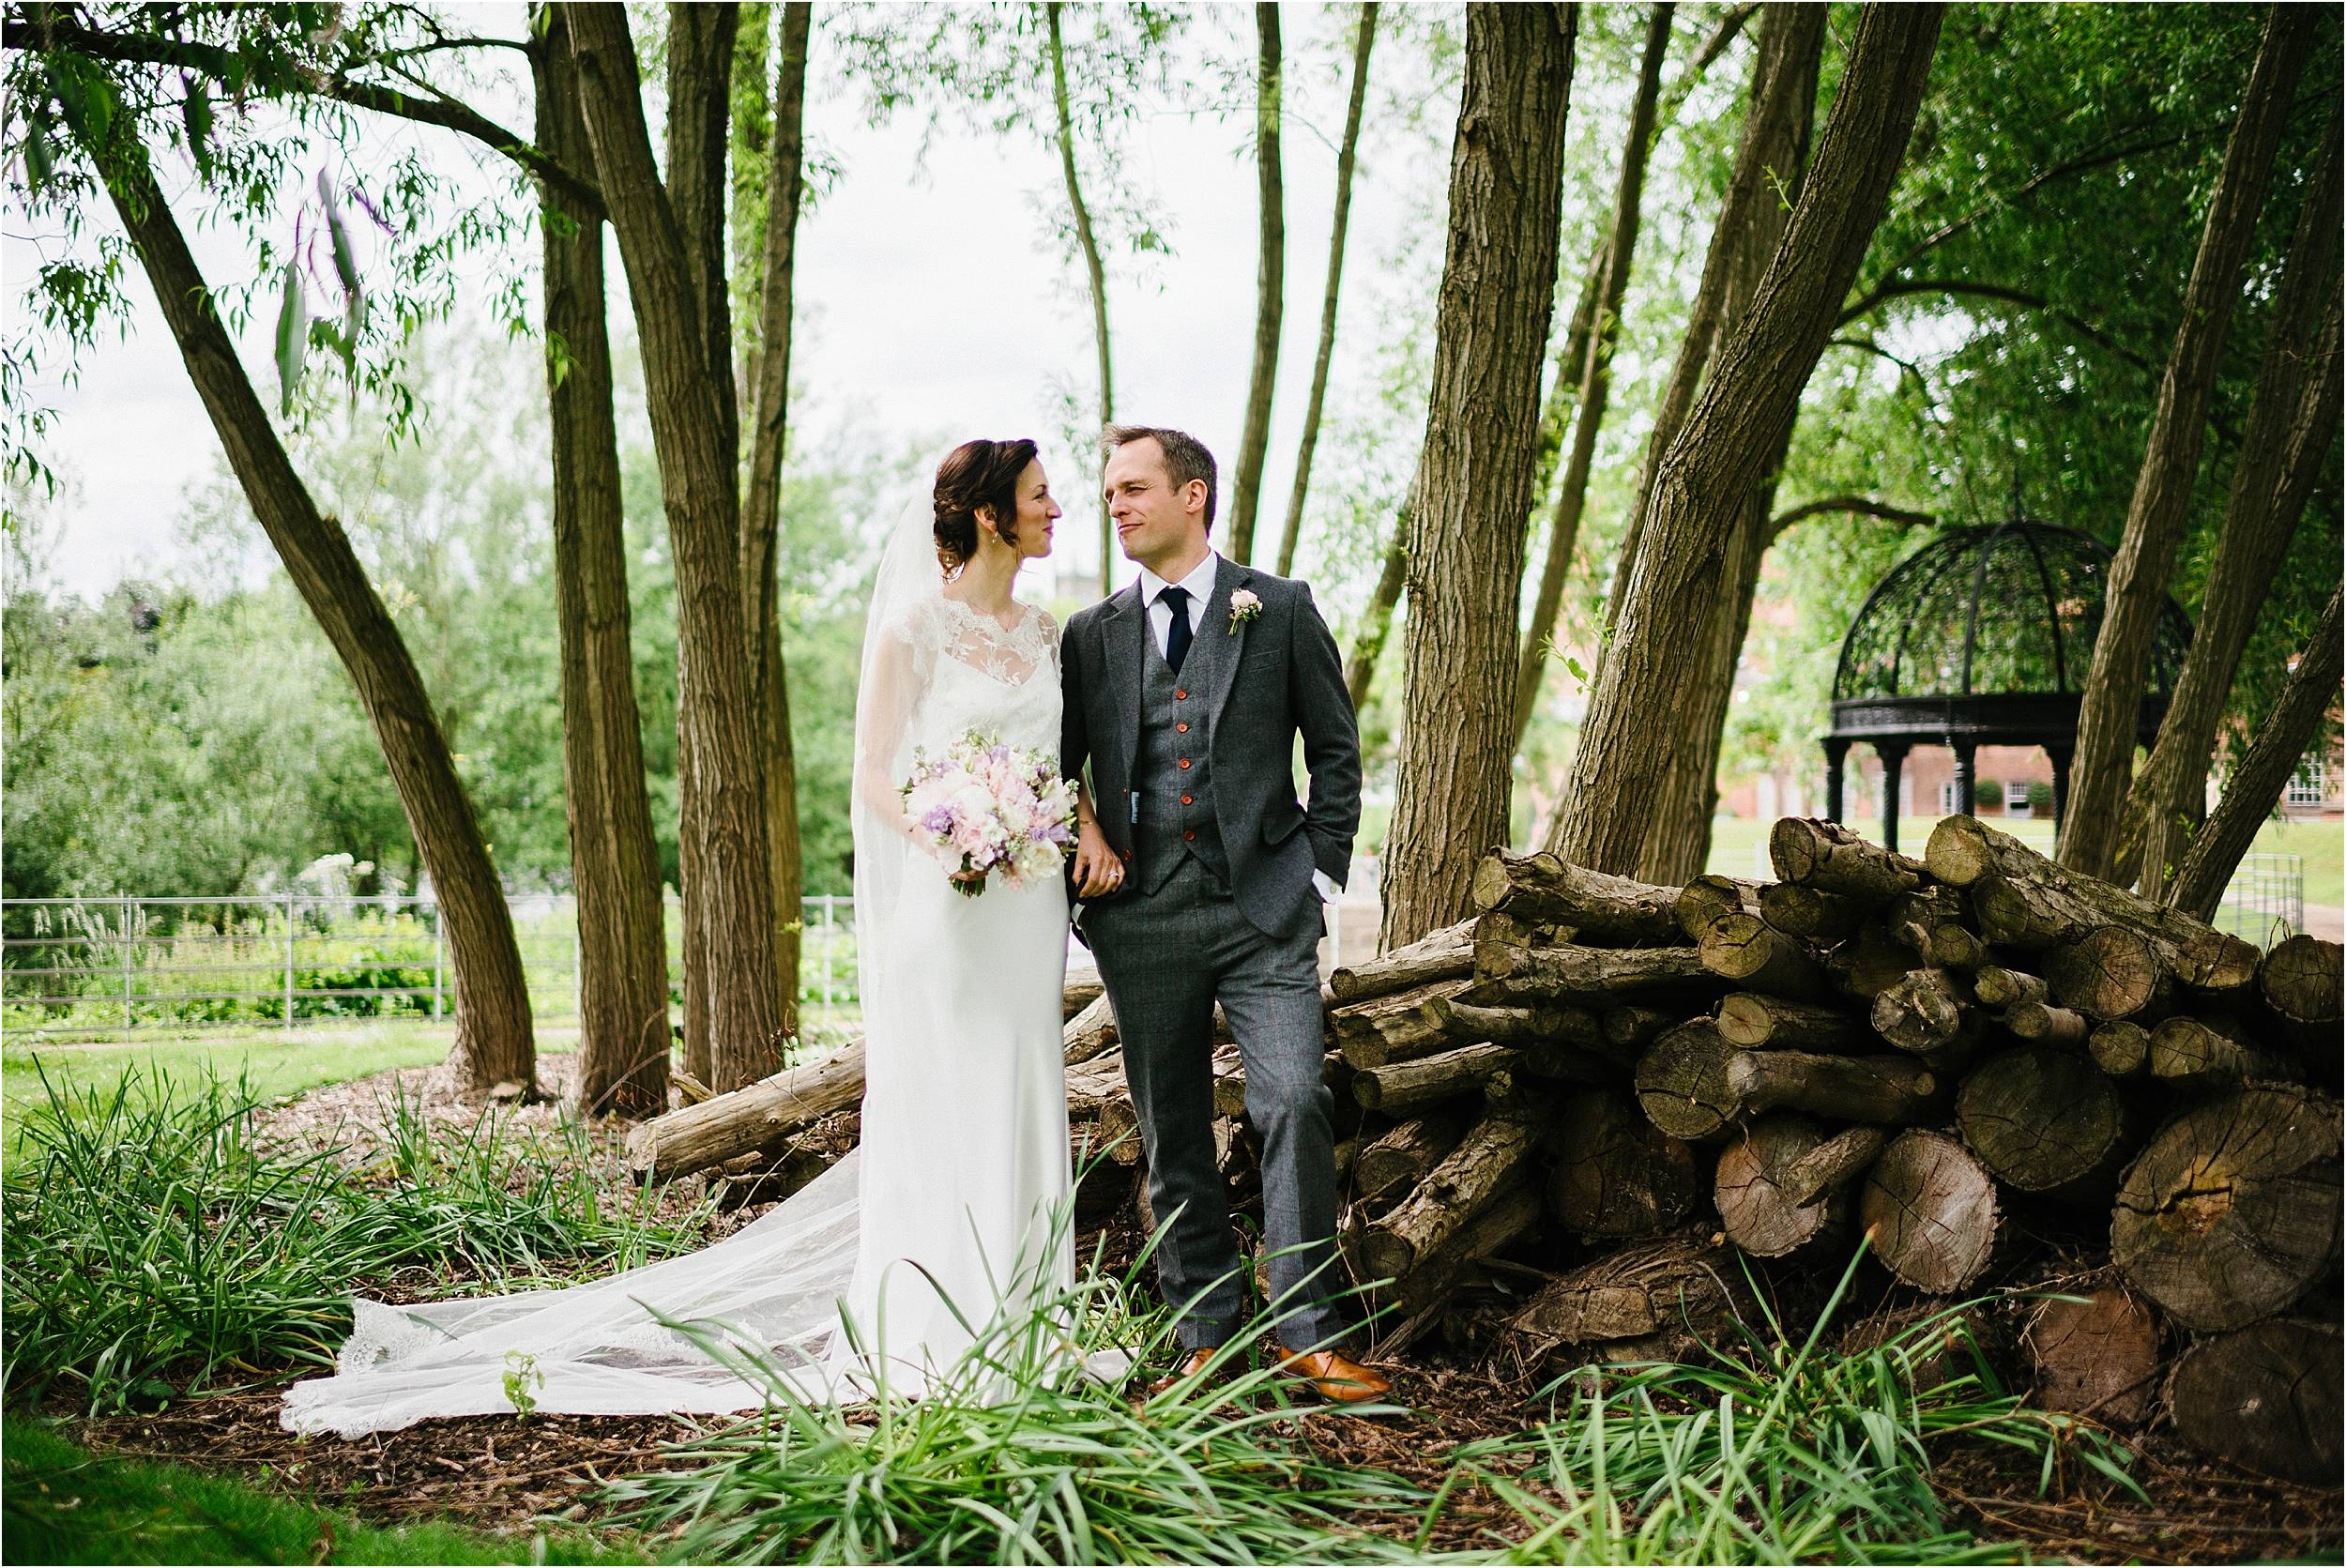 West Mill Derby Wedding Photographer_0151.jpg